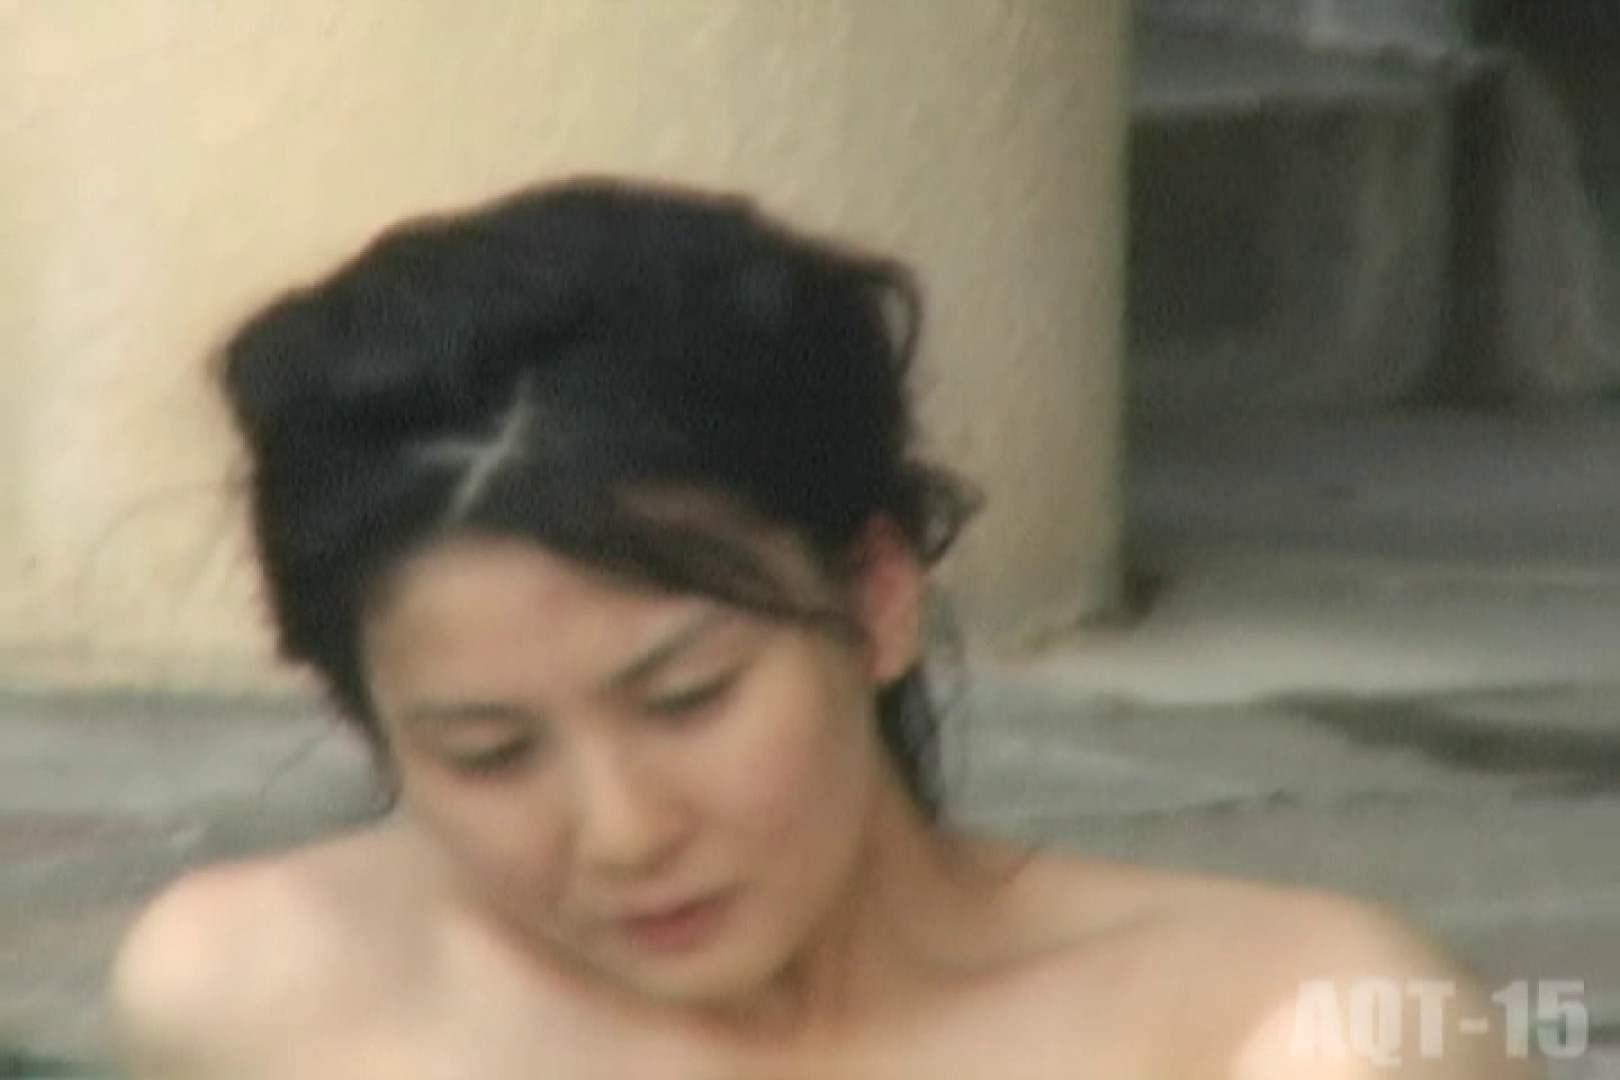 Aquaな露天風呂Vol.832 盗撮映像  99Pix 13